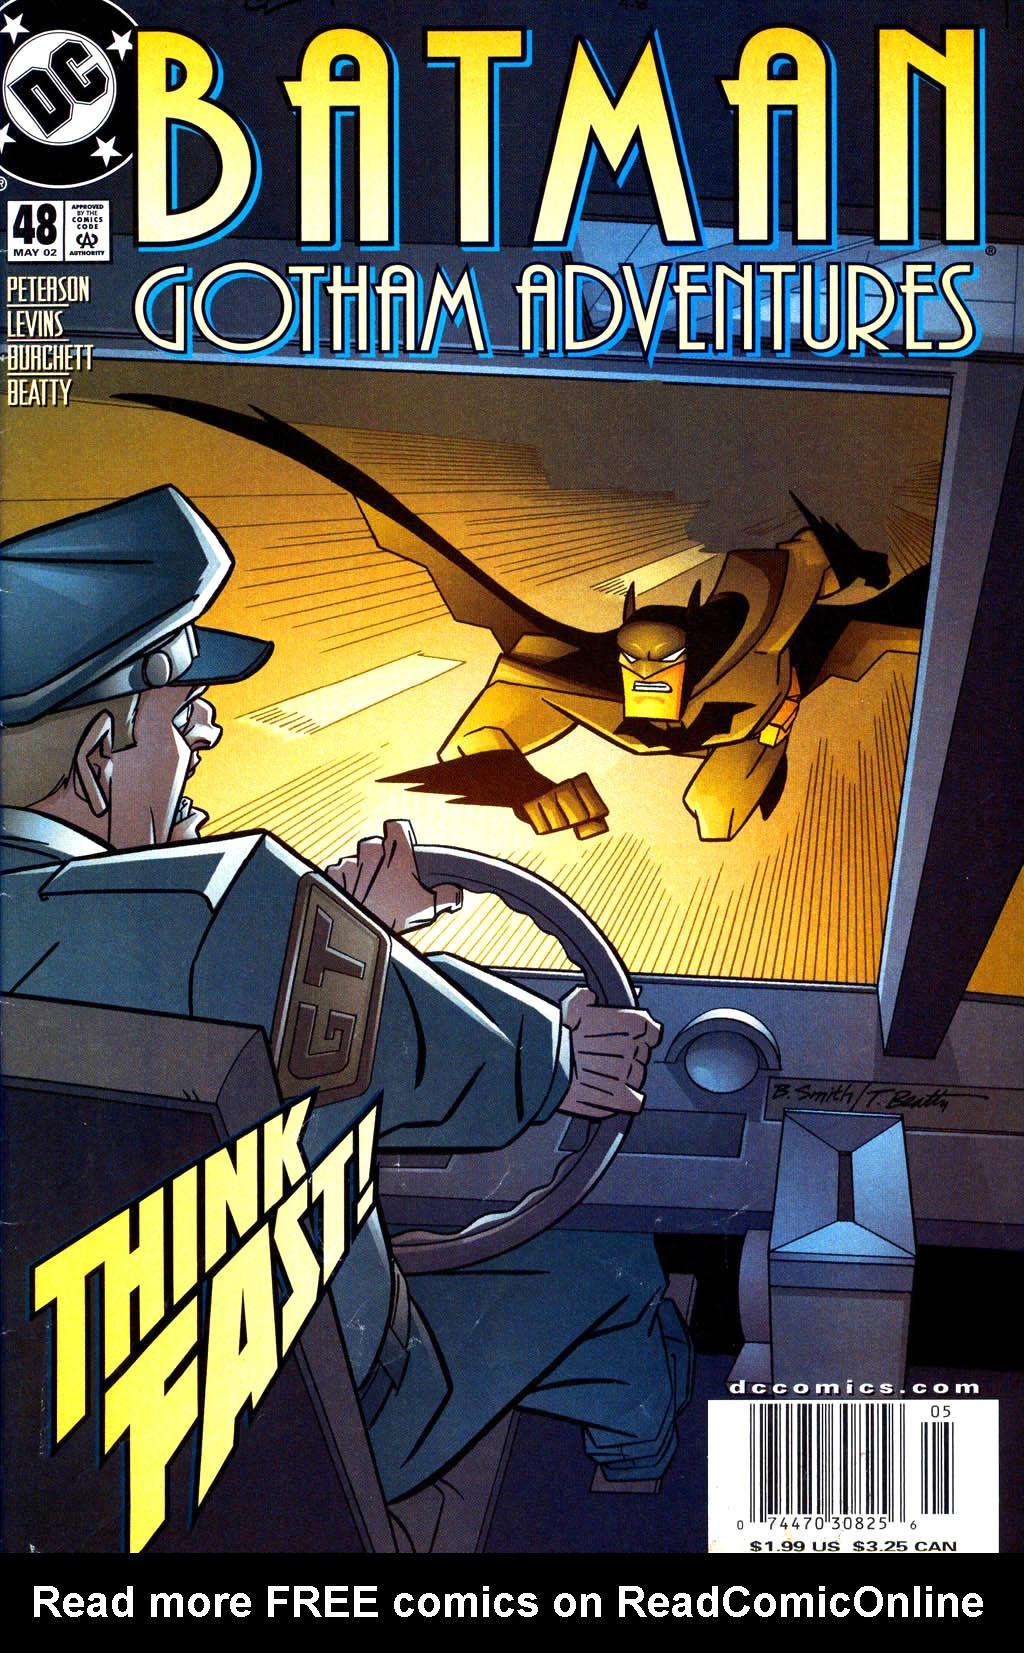 Batman: Gotham Adventures 48 Page 1